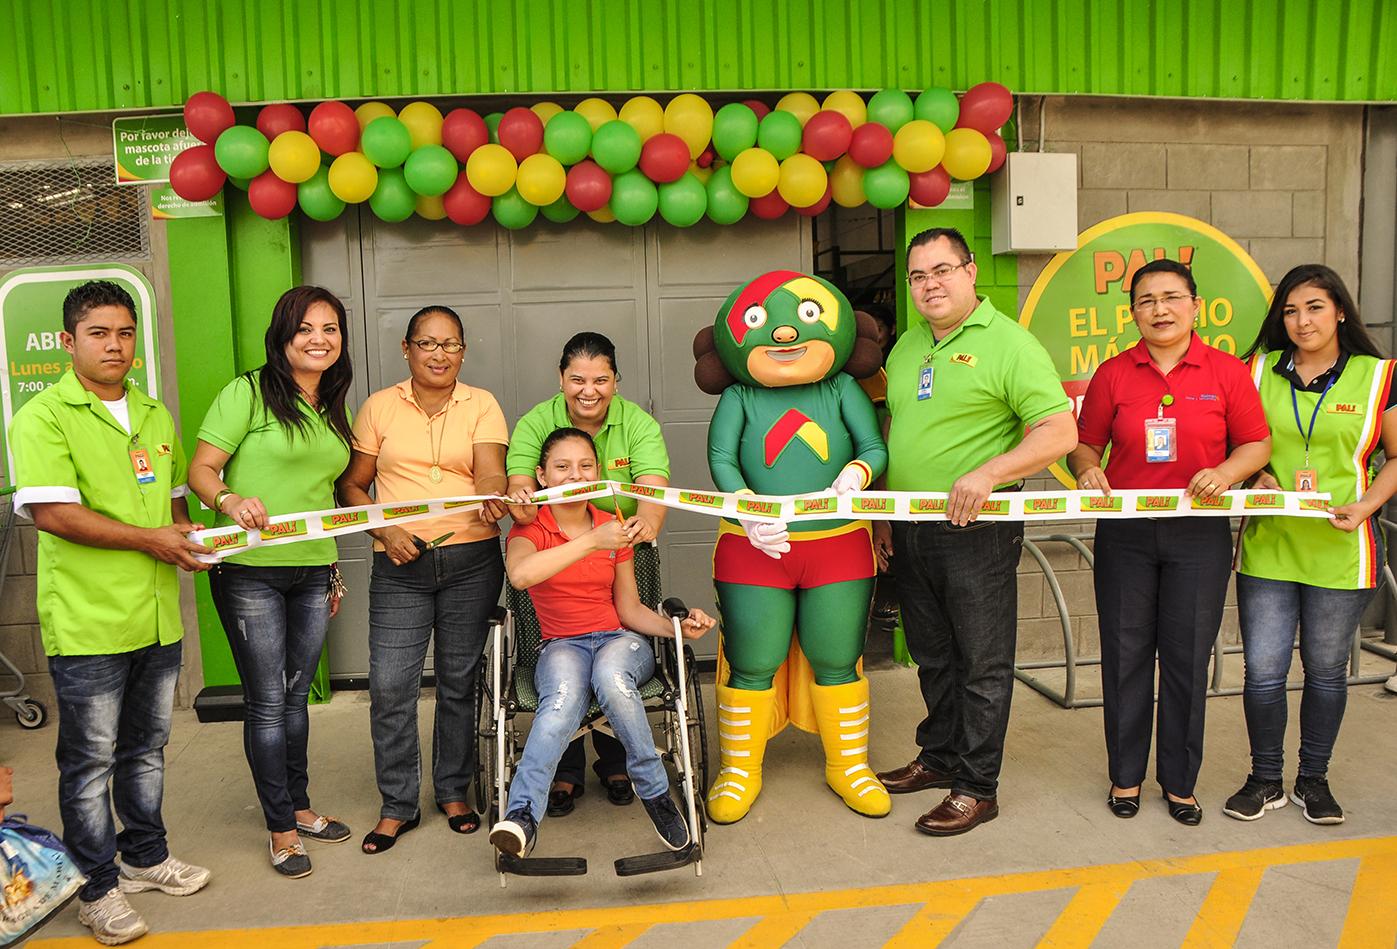 Inauguración de Palí Matiguás en Nicaragua